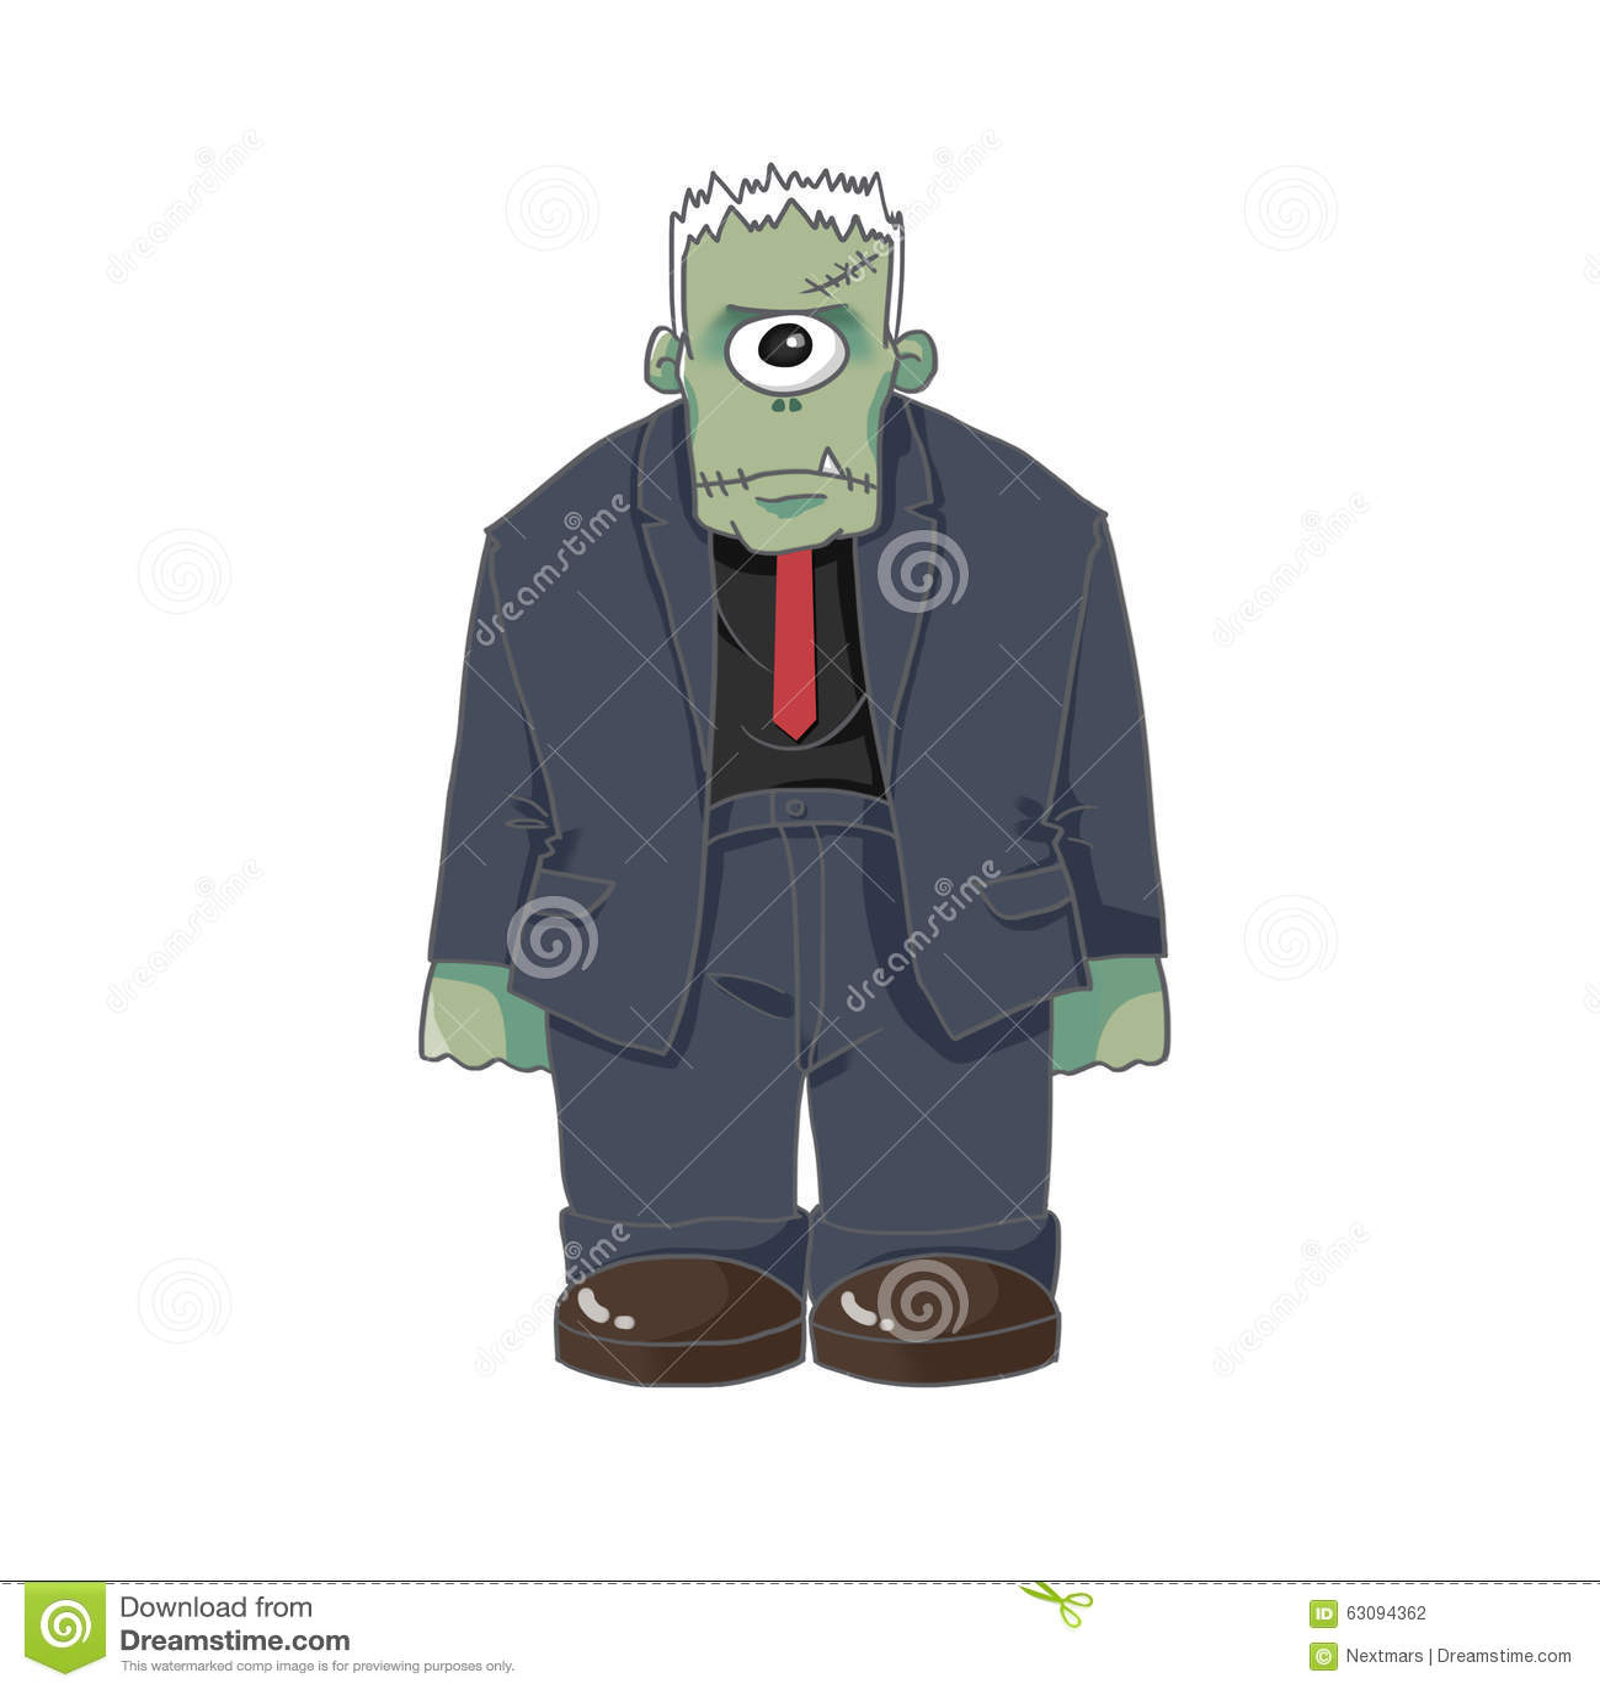 1 Eyed Cartoon Characters : Illustration the one eyed monster killer on white